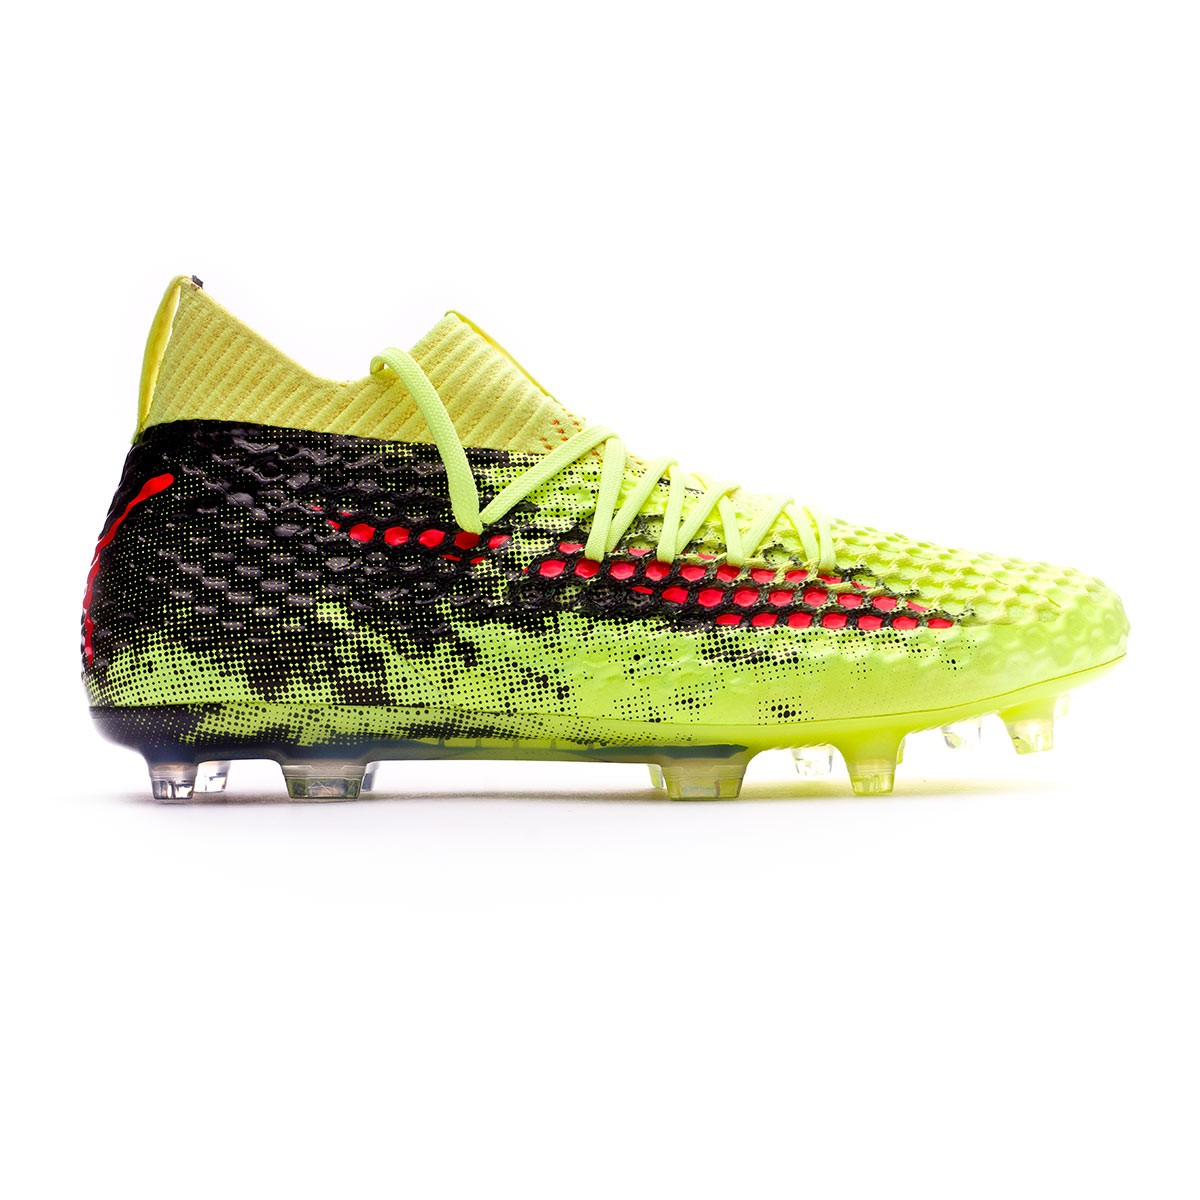 64cb1368f9a85 Zapatos de fútbol Puma Future 18.1 Netfit FG Fizzy Yellow-Red Blast-Puma  Black - Tienda de fútbol Fútbol Emotion